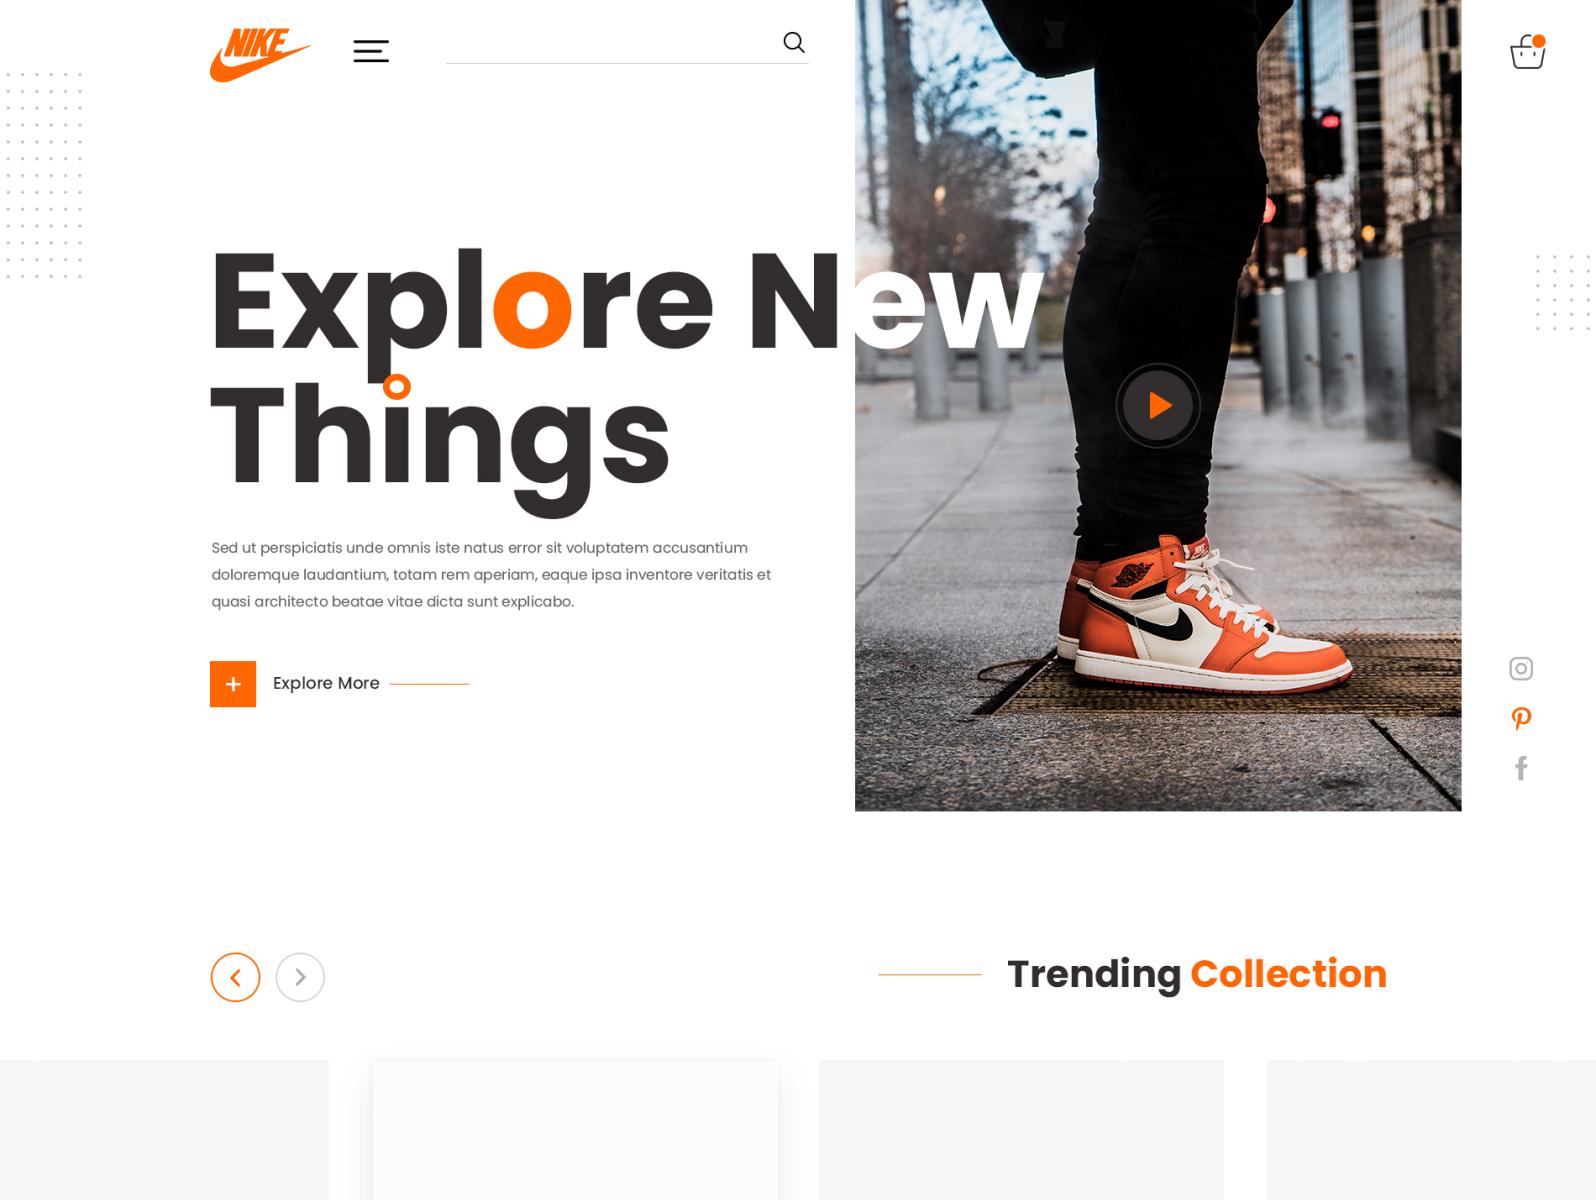 Best UI Design for Online Shoe Stores